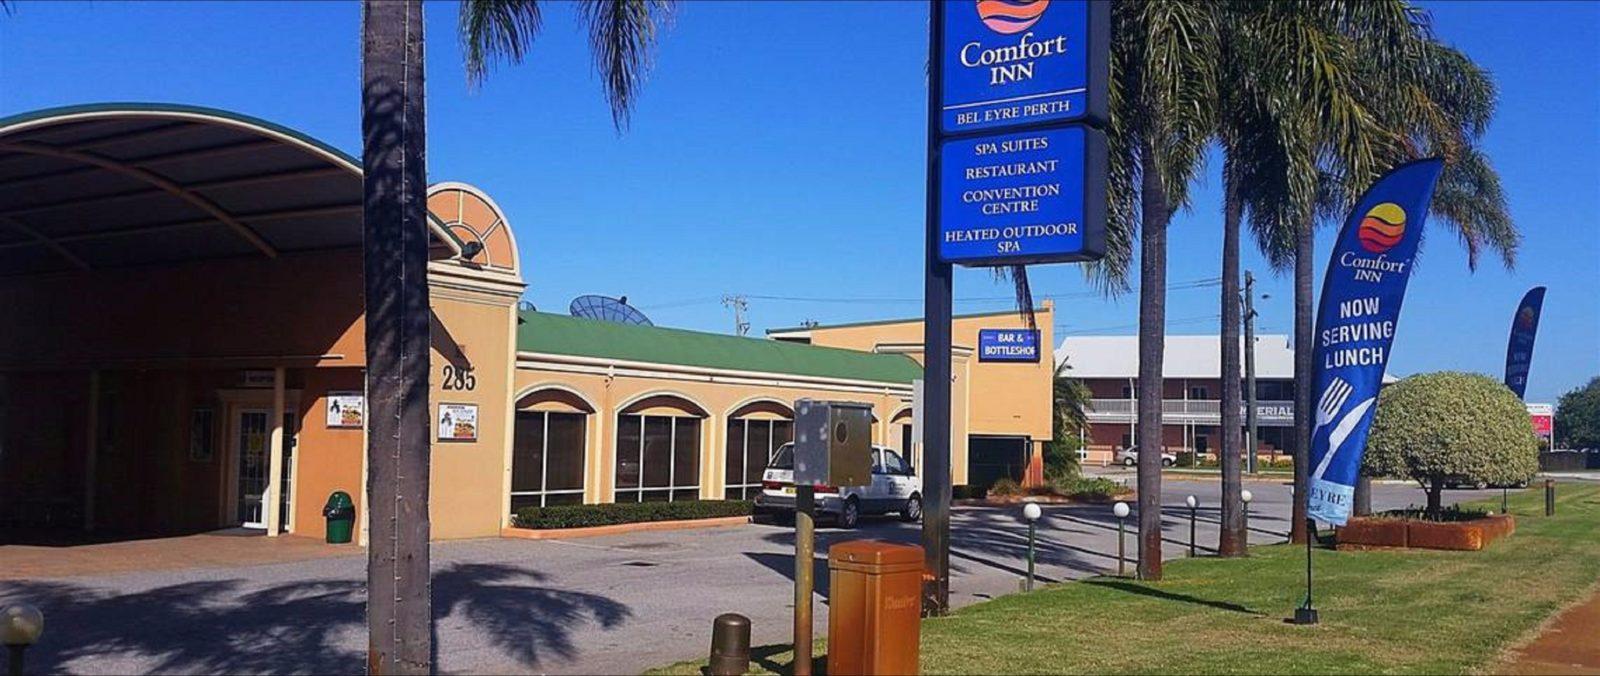 Comfort Inn Bel Eyre Perth, Belmont, Western Australia